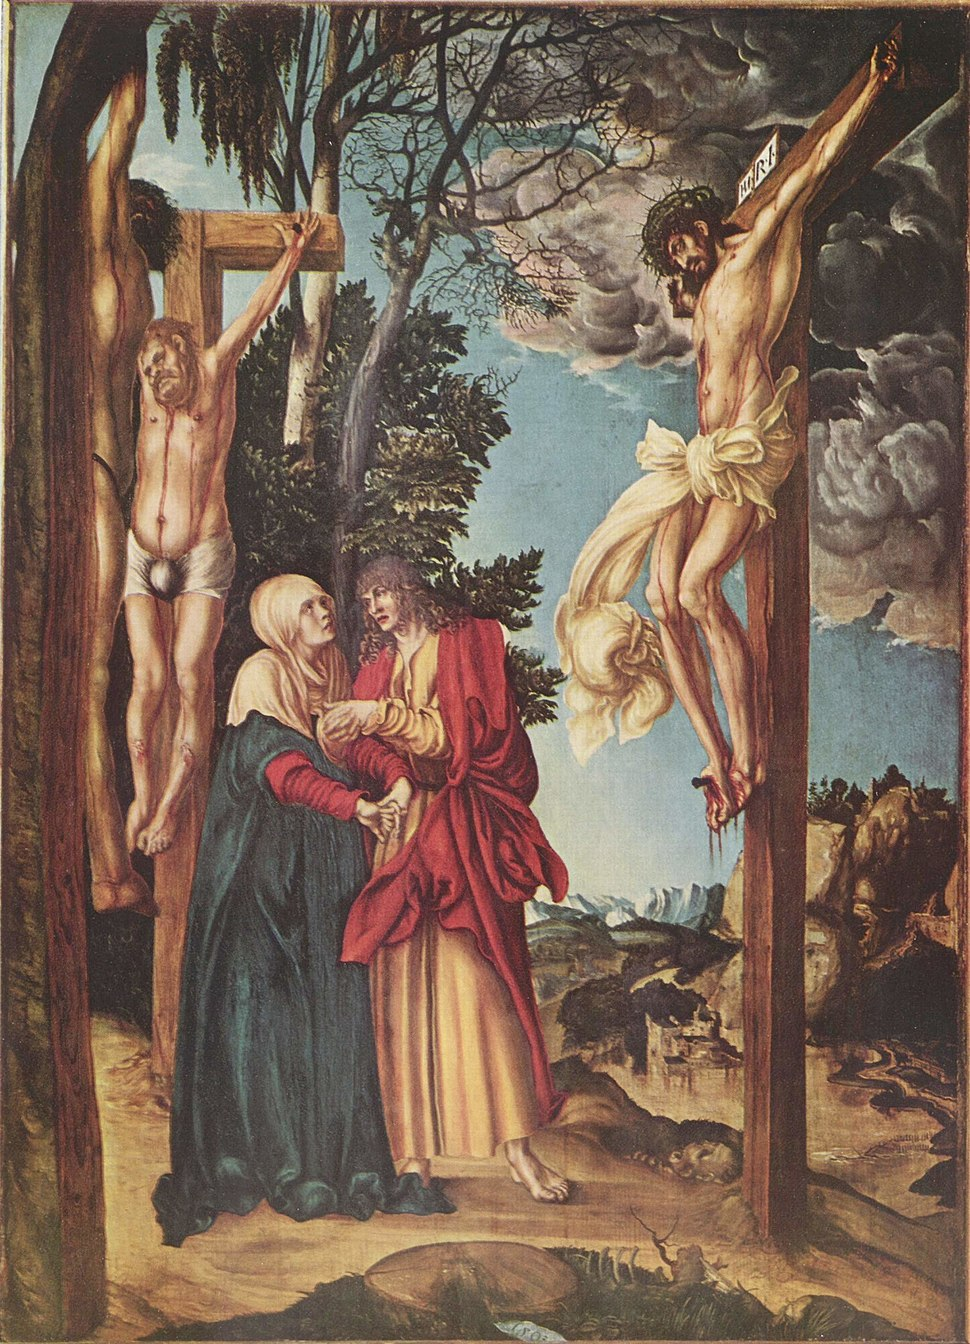 Lucas Cranach d. %C3%84. - The Lamentation of Christ - The Schlei%C3%9Fheim Crucifixion - Alte Pinakothek.jpg